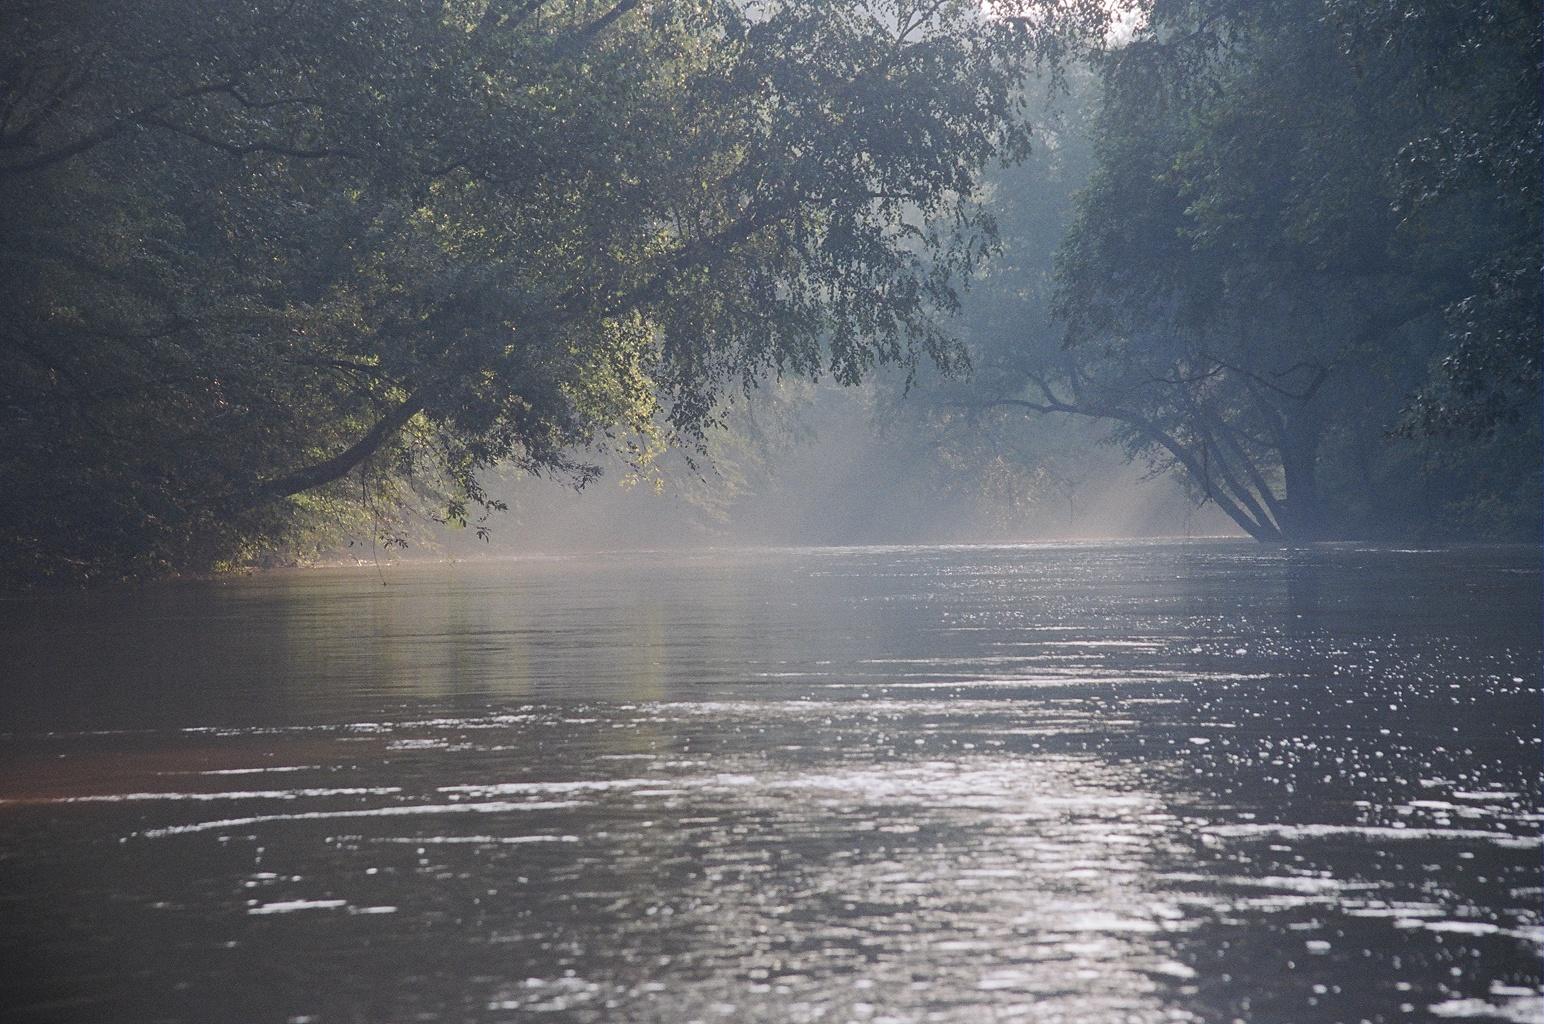 Etowah River etowahscenicriver.org